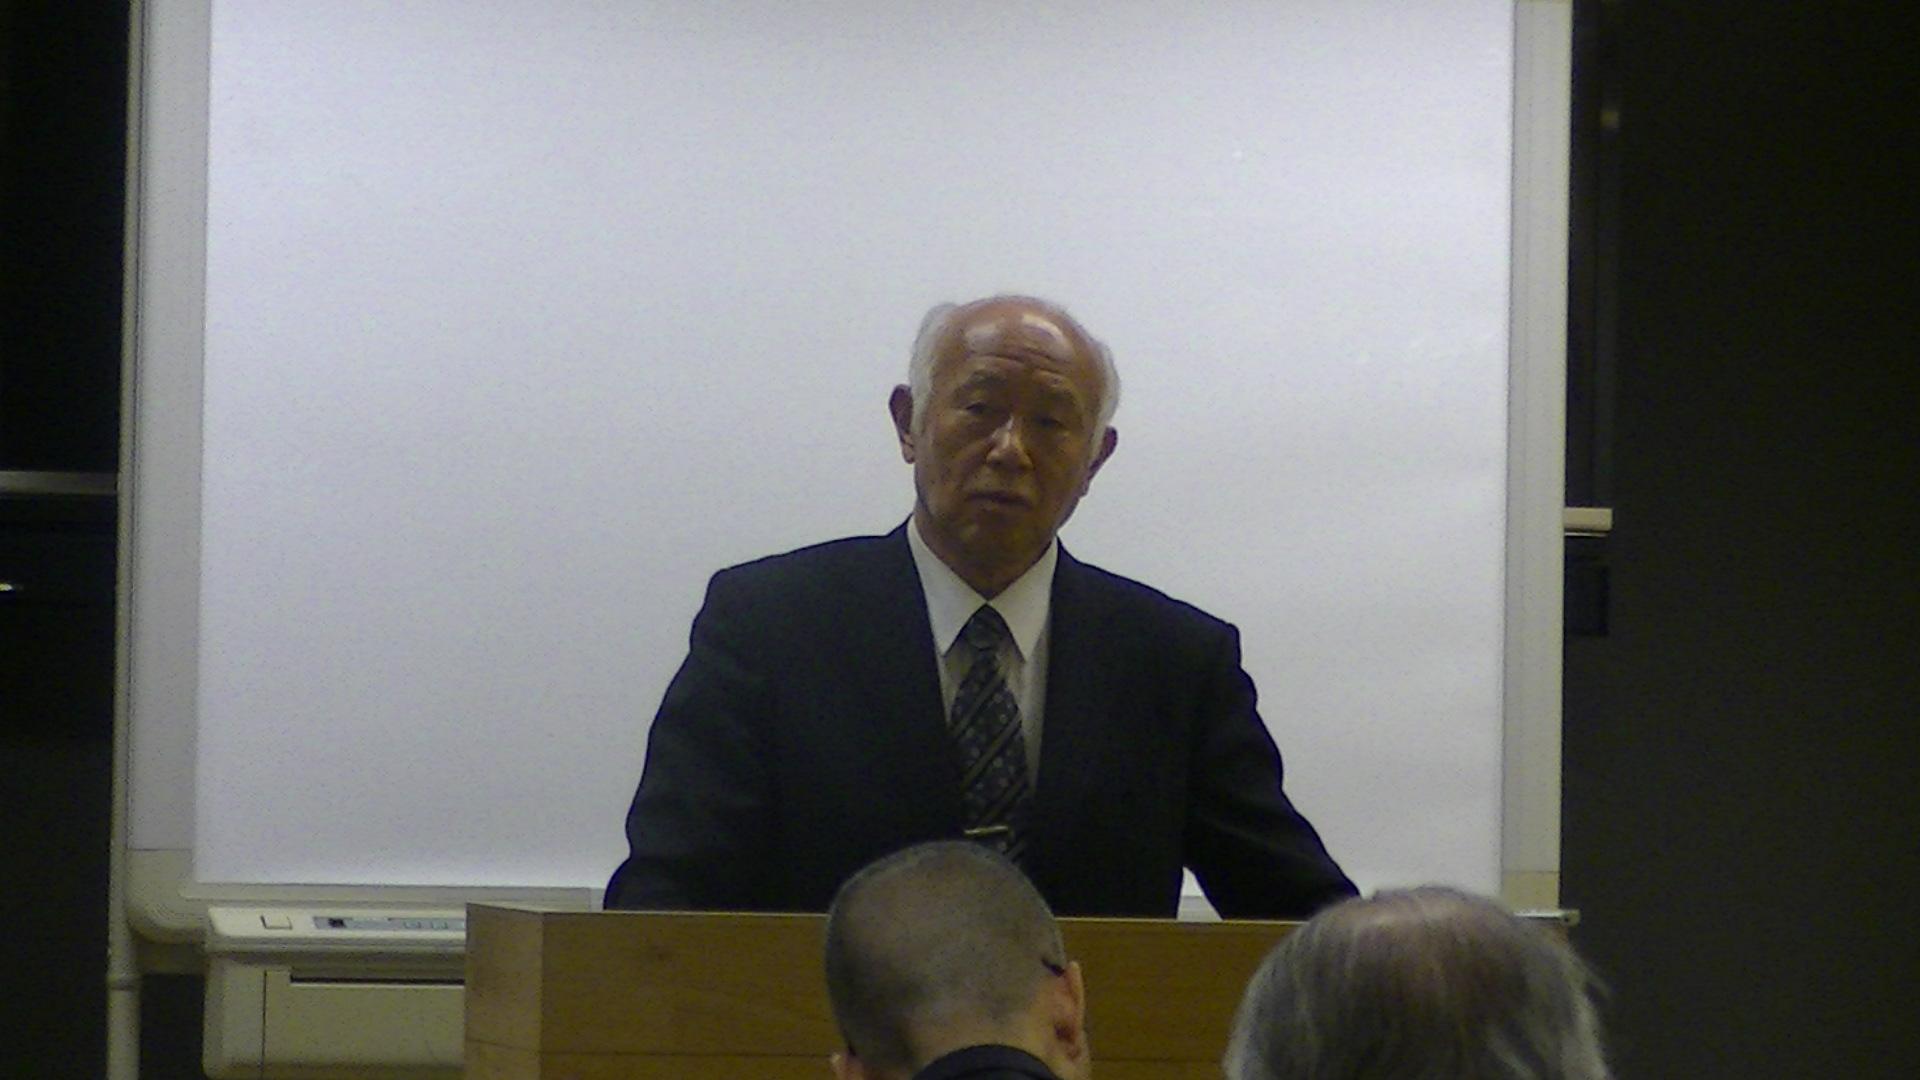 PIC 0096 - 4月1日東京思風塾の開催になります。